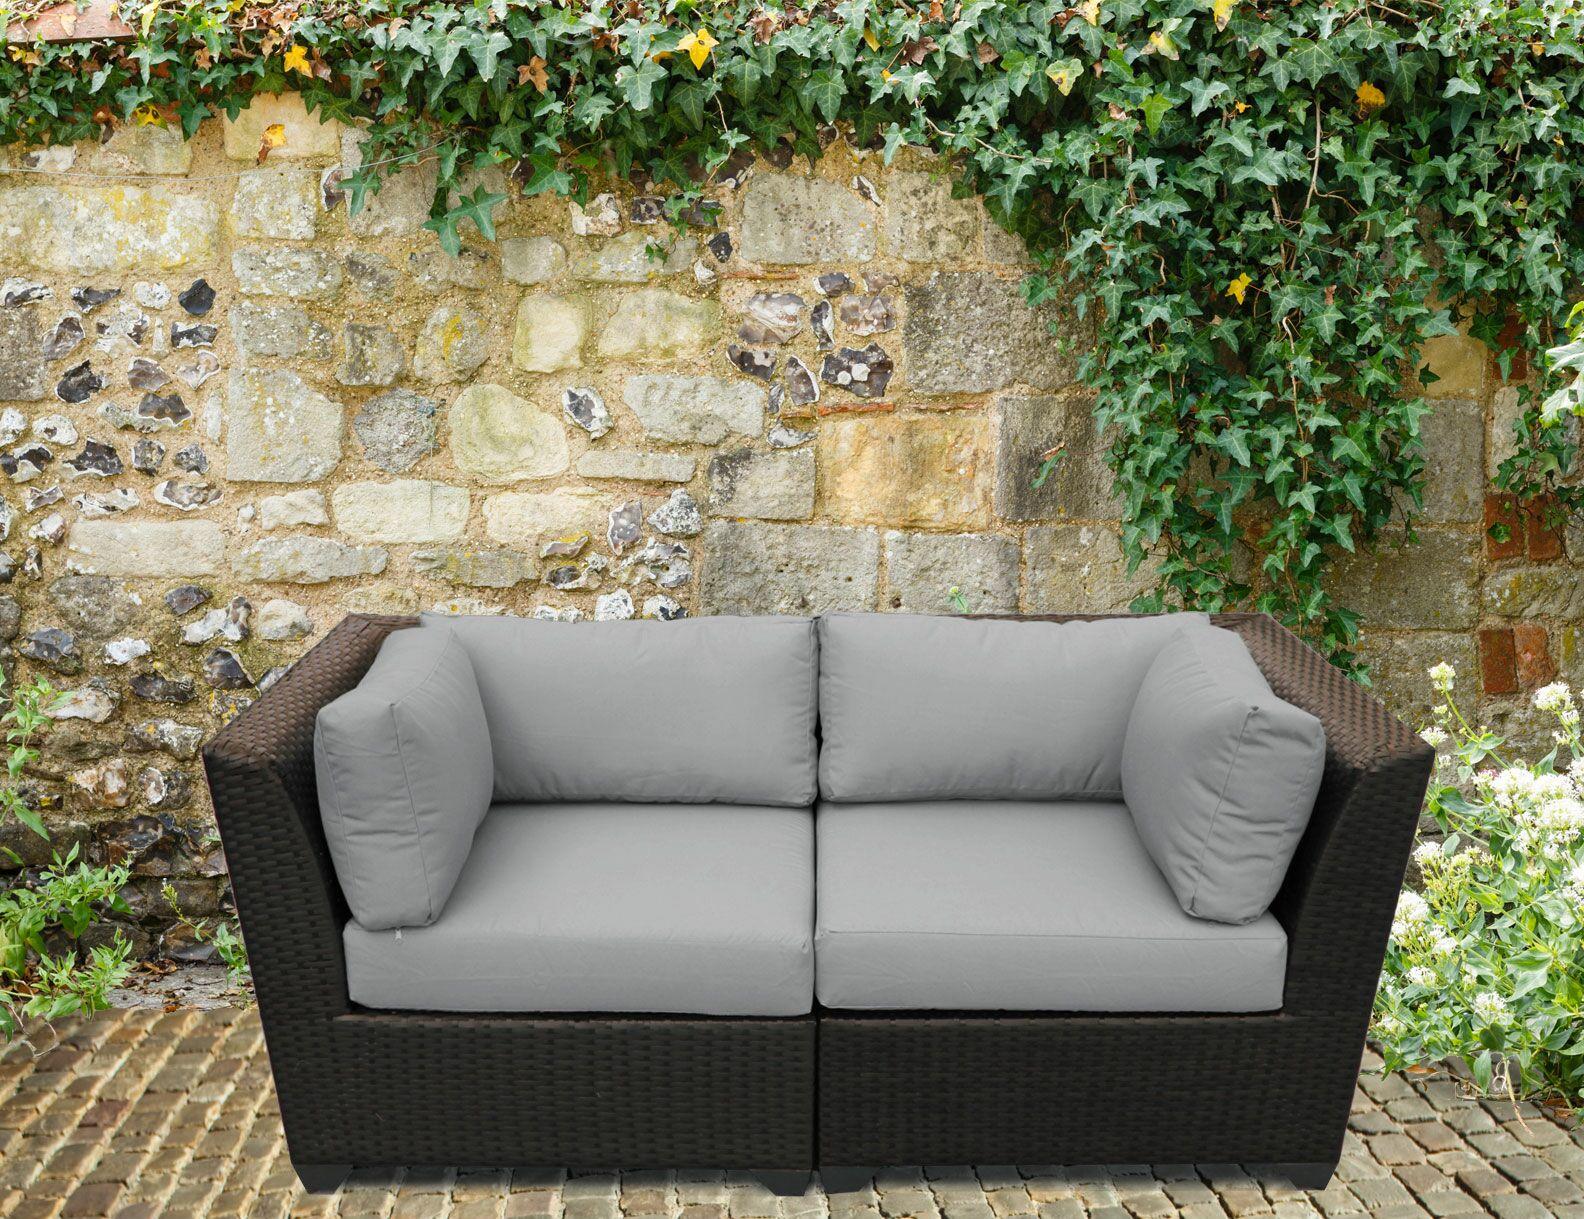 Barbados 2 Piece Conversation Set with Cushions Color: Gray